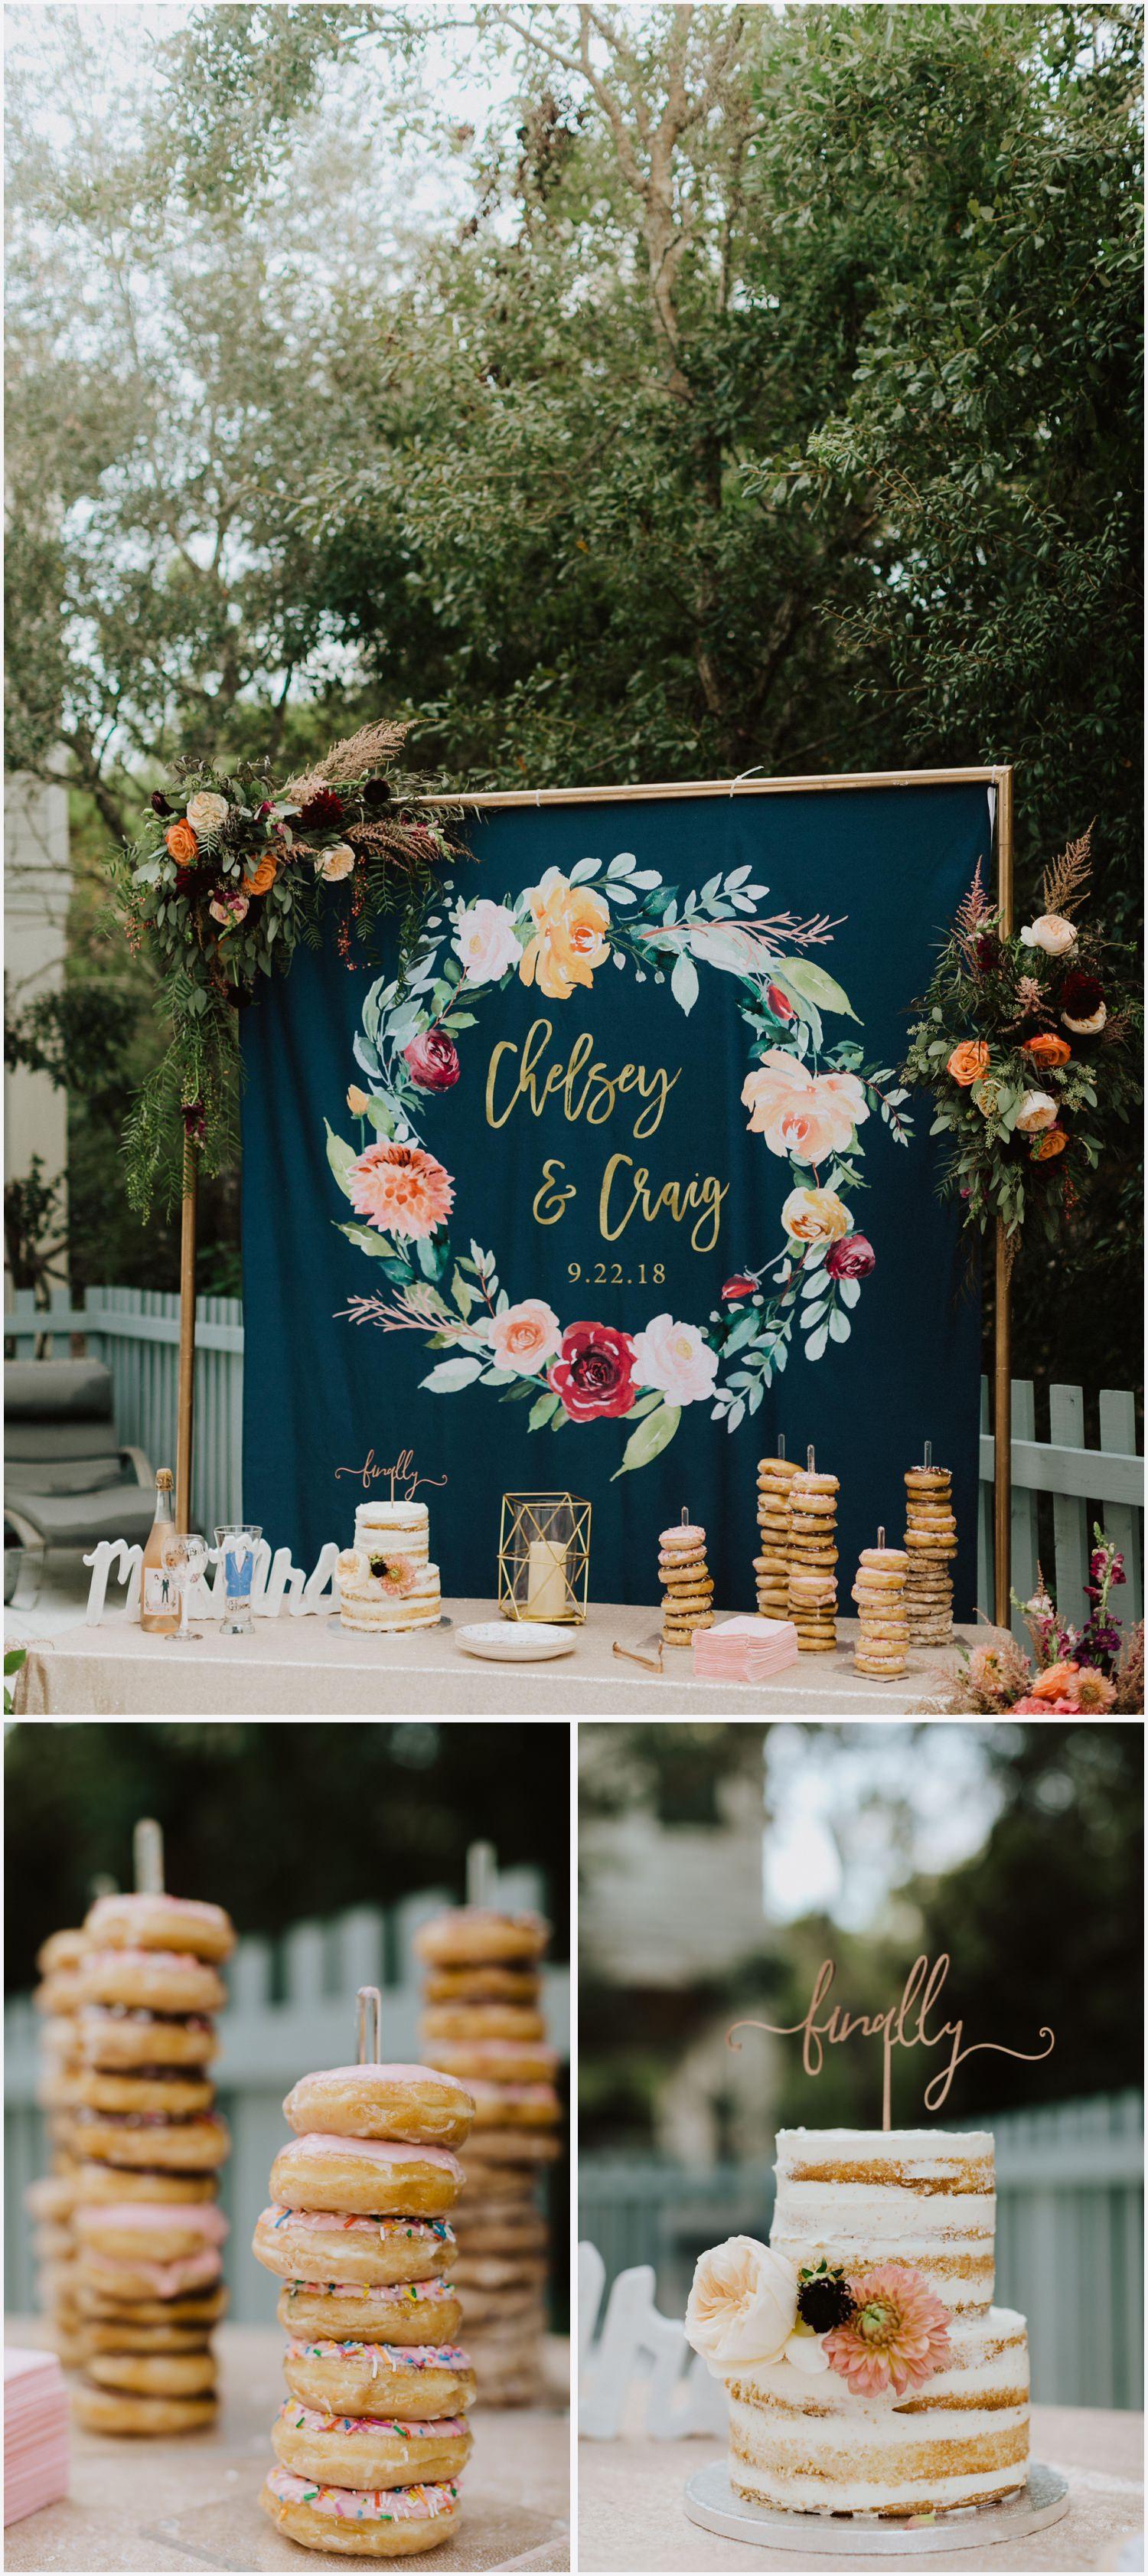 Wedding reception decor at a Rosemary Beach house